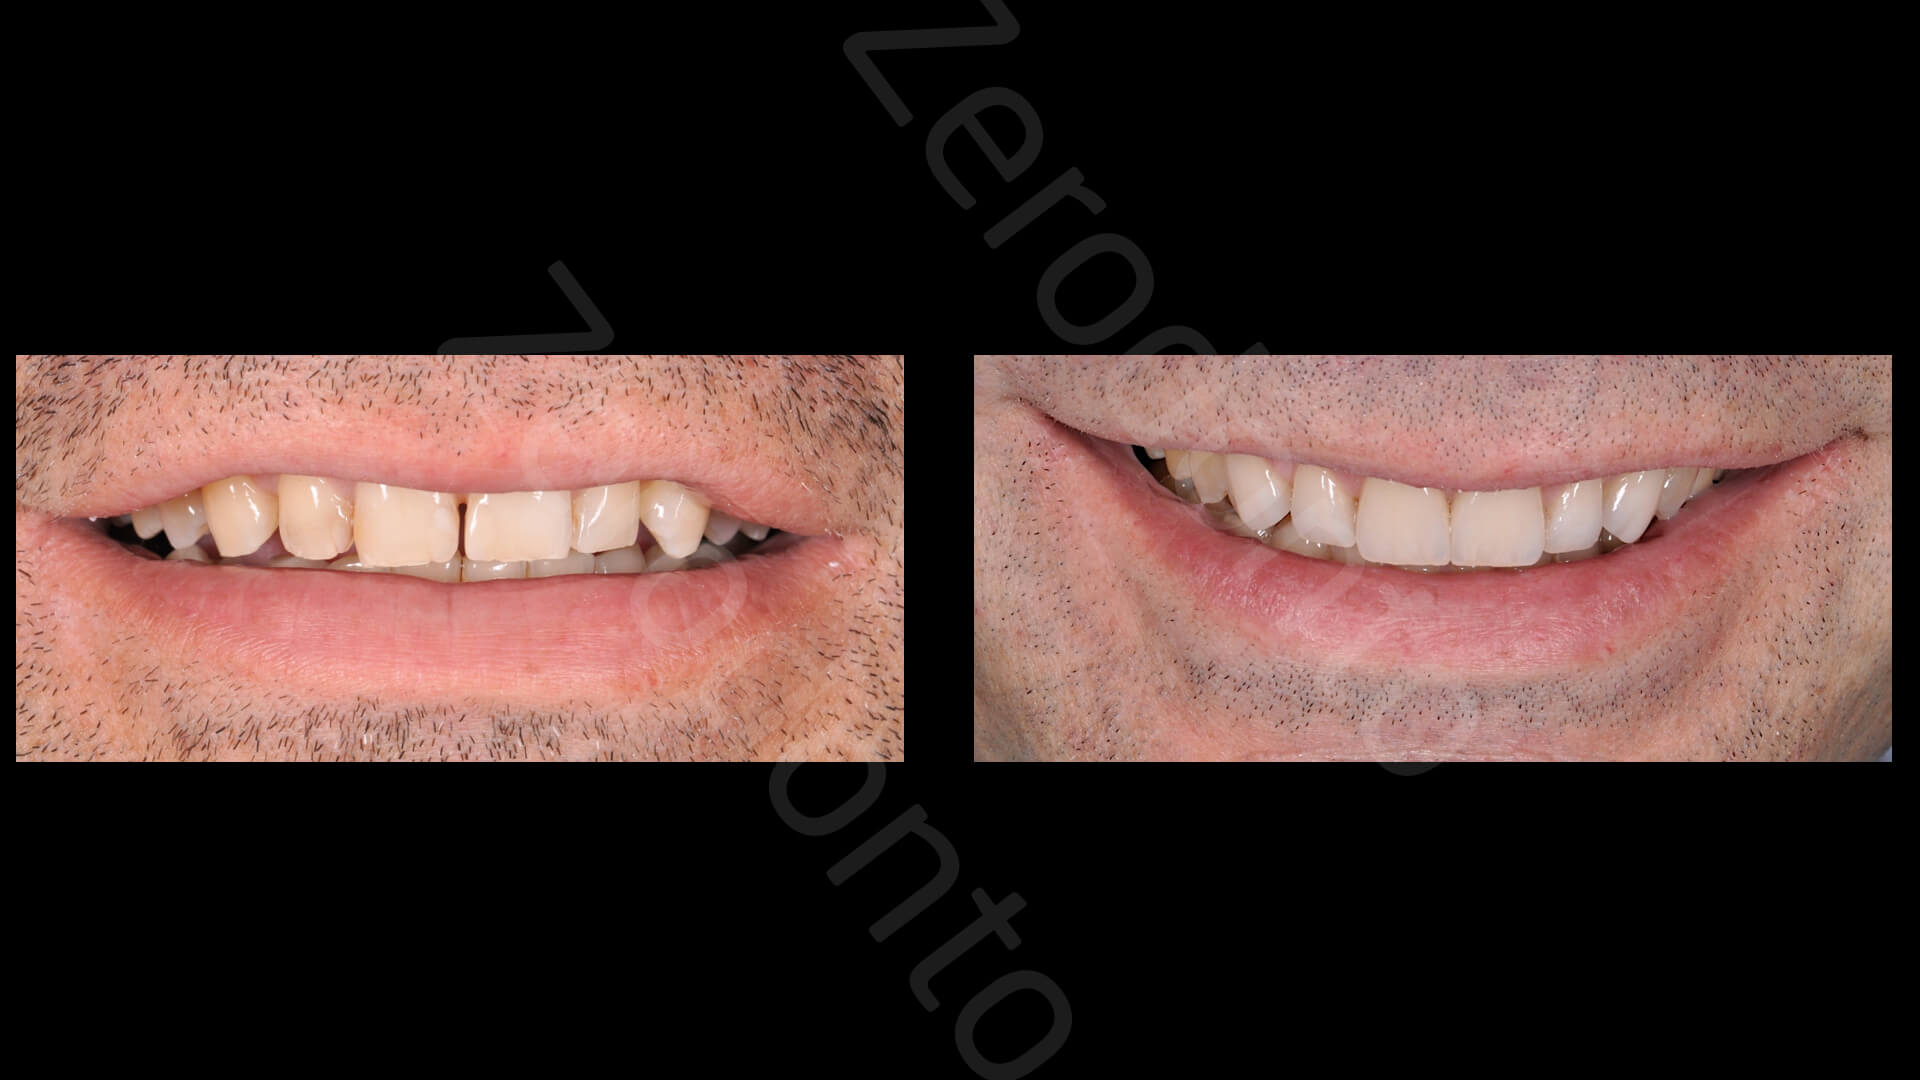 Case 35 | Prosthodontic Award 2015 | Italy